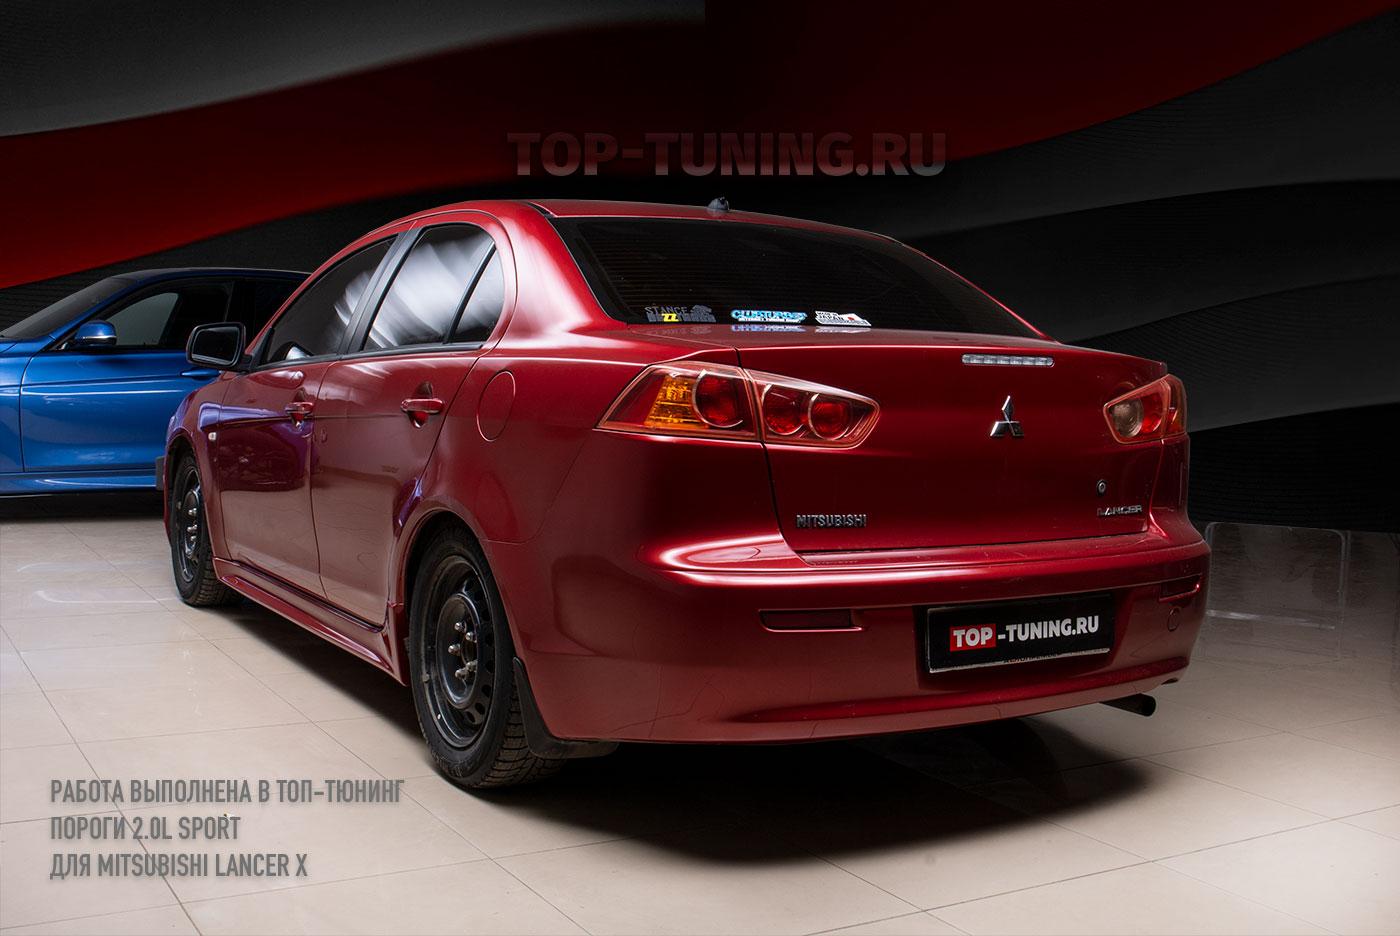 4579 Накладки на пороги Zodiac (2L Sport) ABS на Mitsubishi Lancer 10 (X)